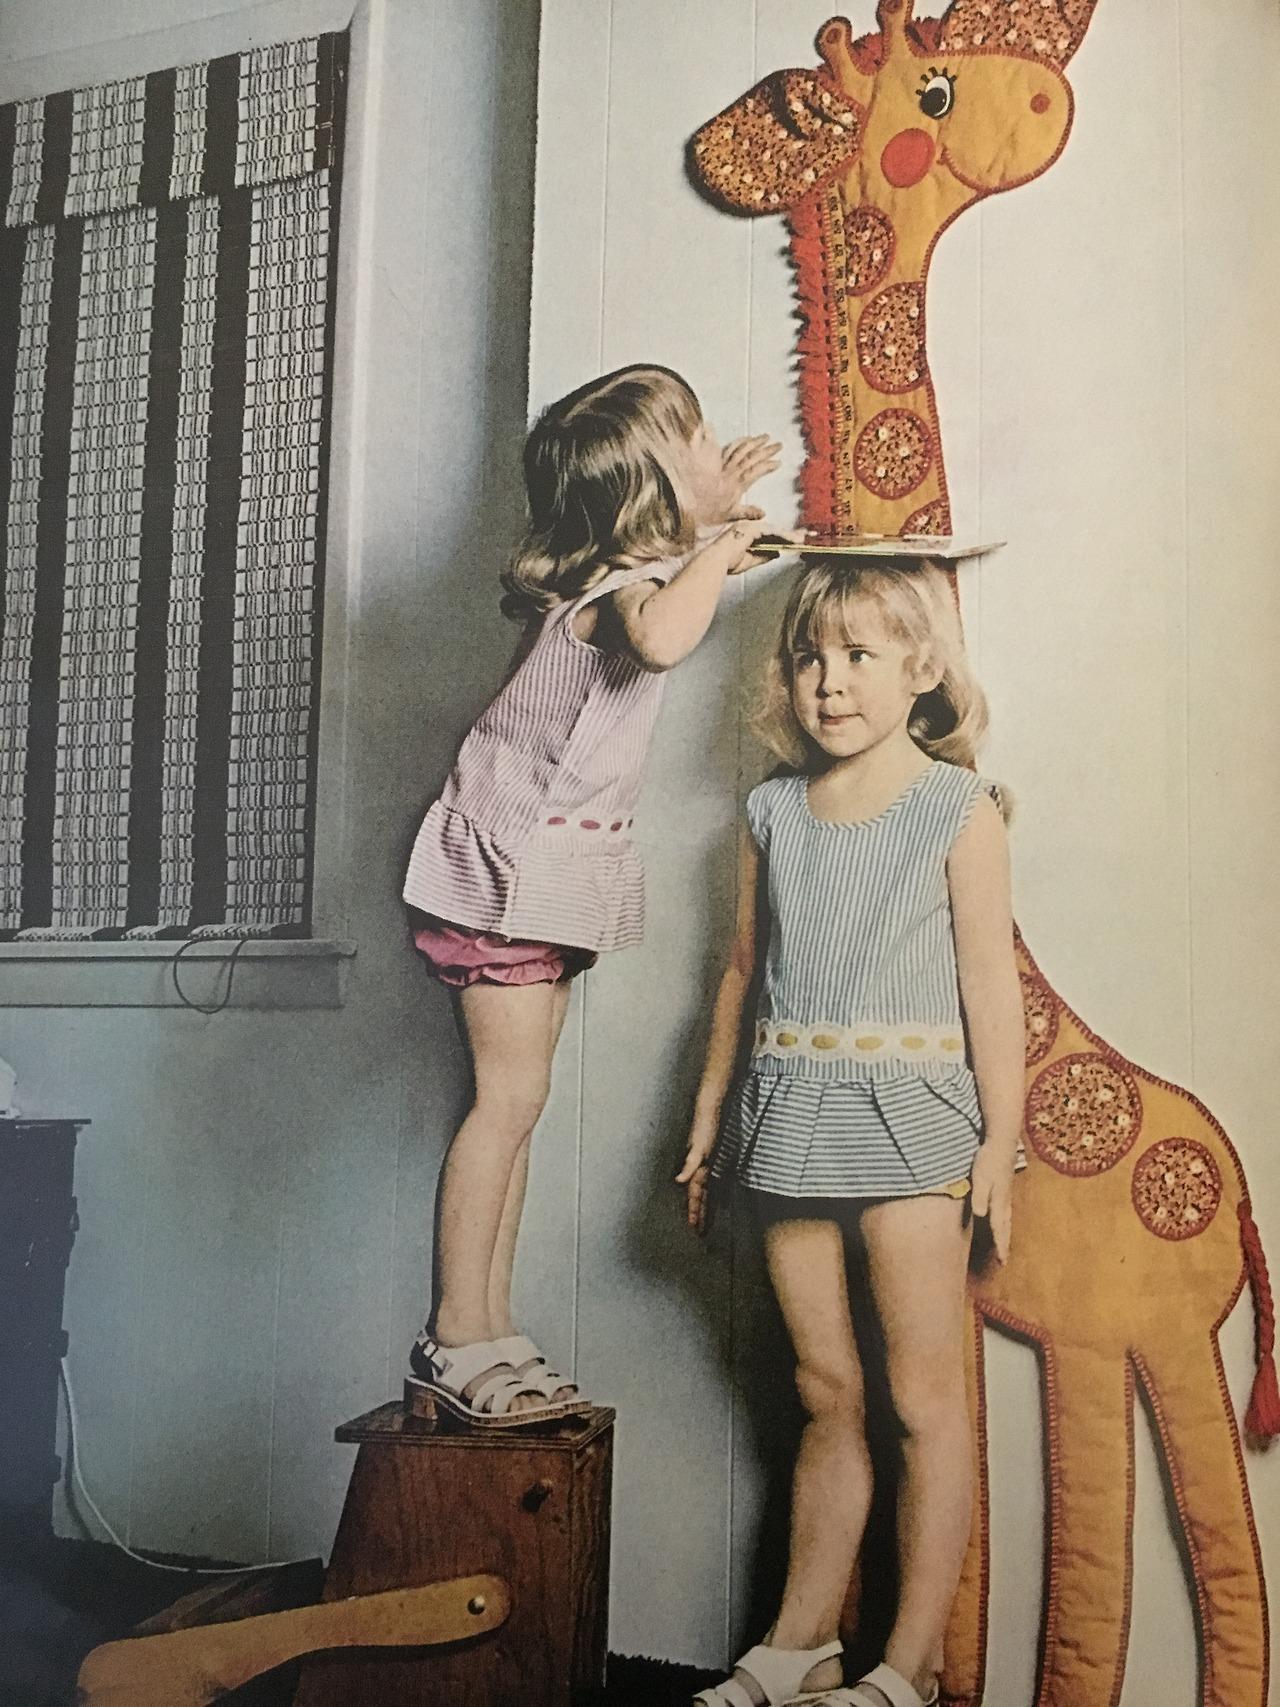 Giraffe growth chart.  Better Homes and Gardens. July 1974.